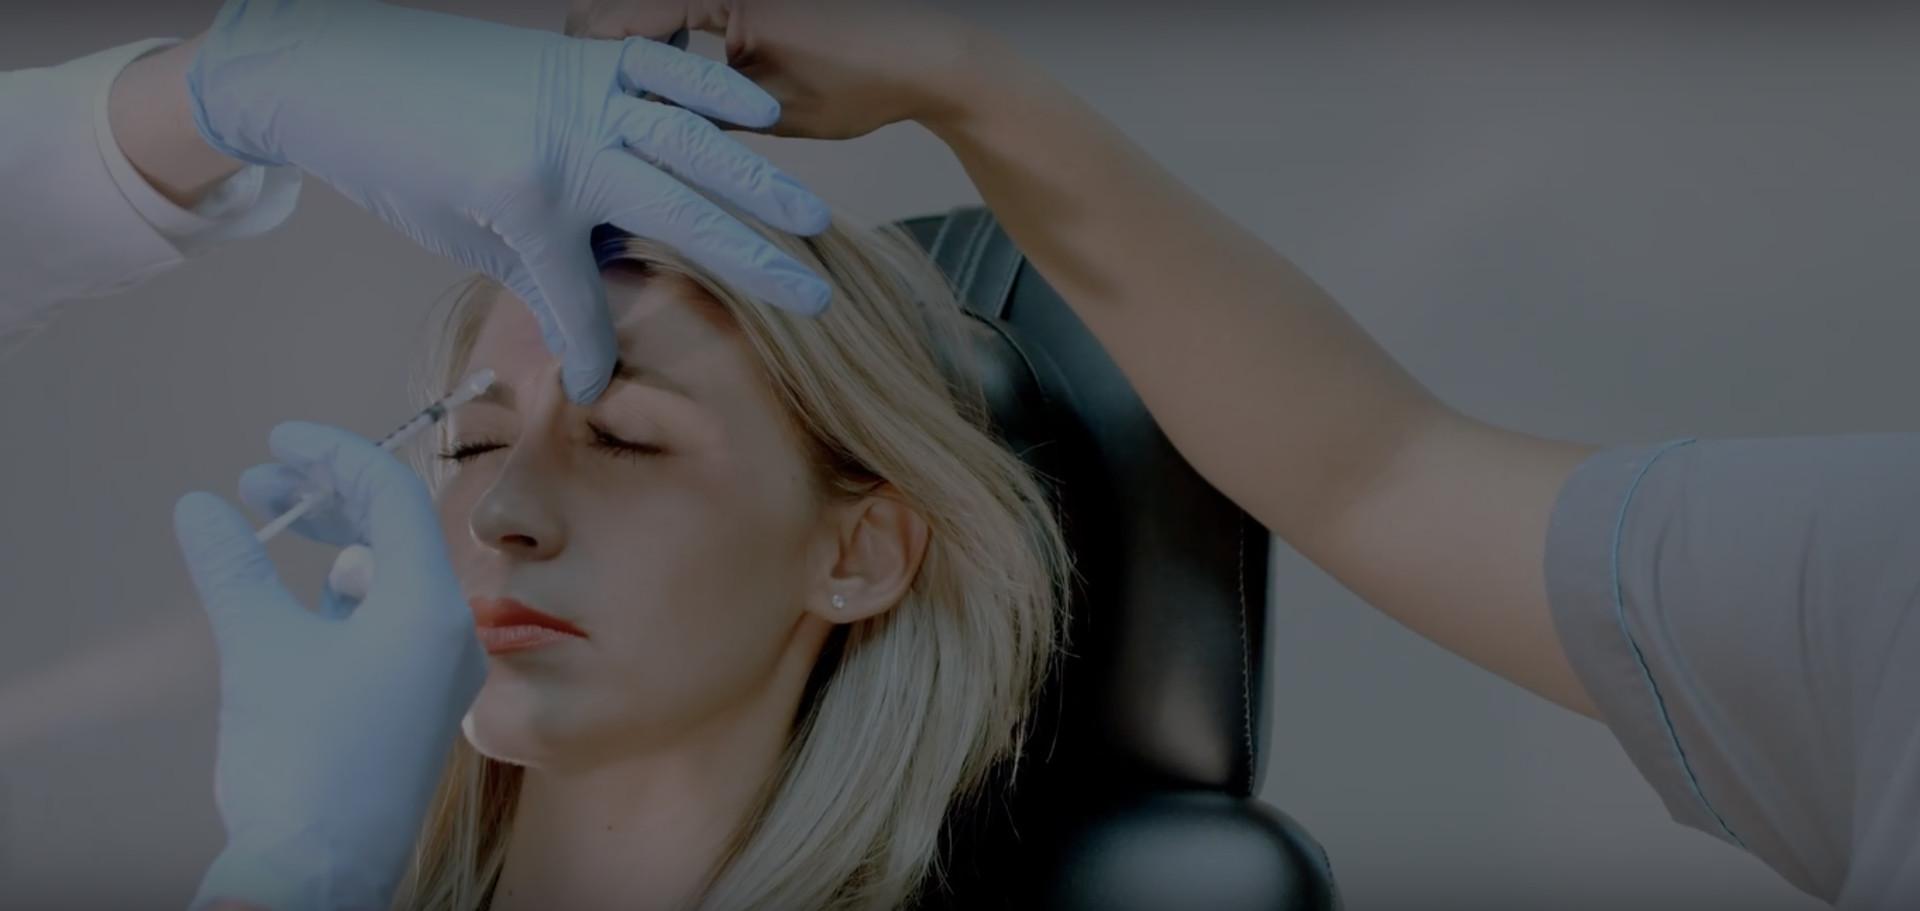 aplicacion de botox en monterrey